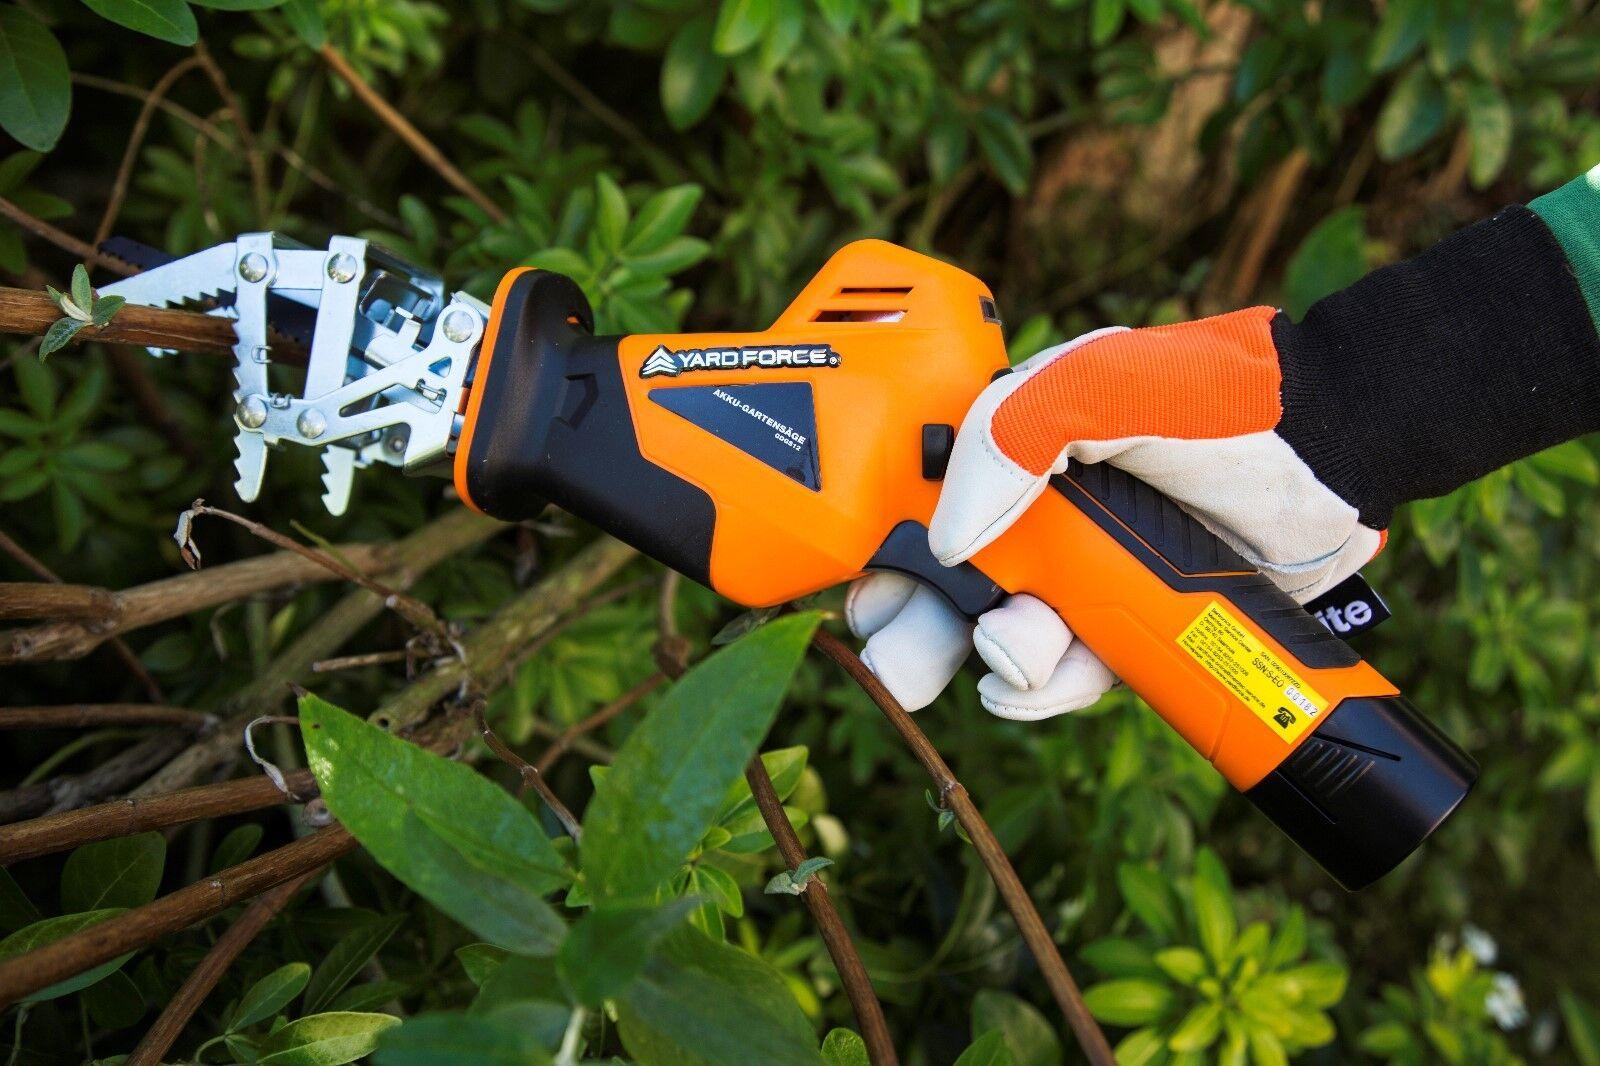 YardForce Akku GDGS12 GDGS12 GDGS12 Gartensäge GDGS12 200mm | Gute Qualität  | Verkaufspreis  f7592c